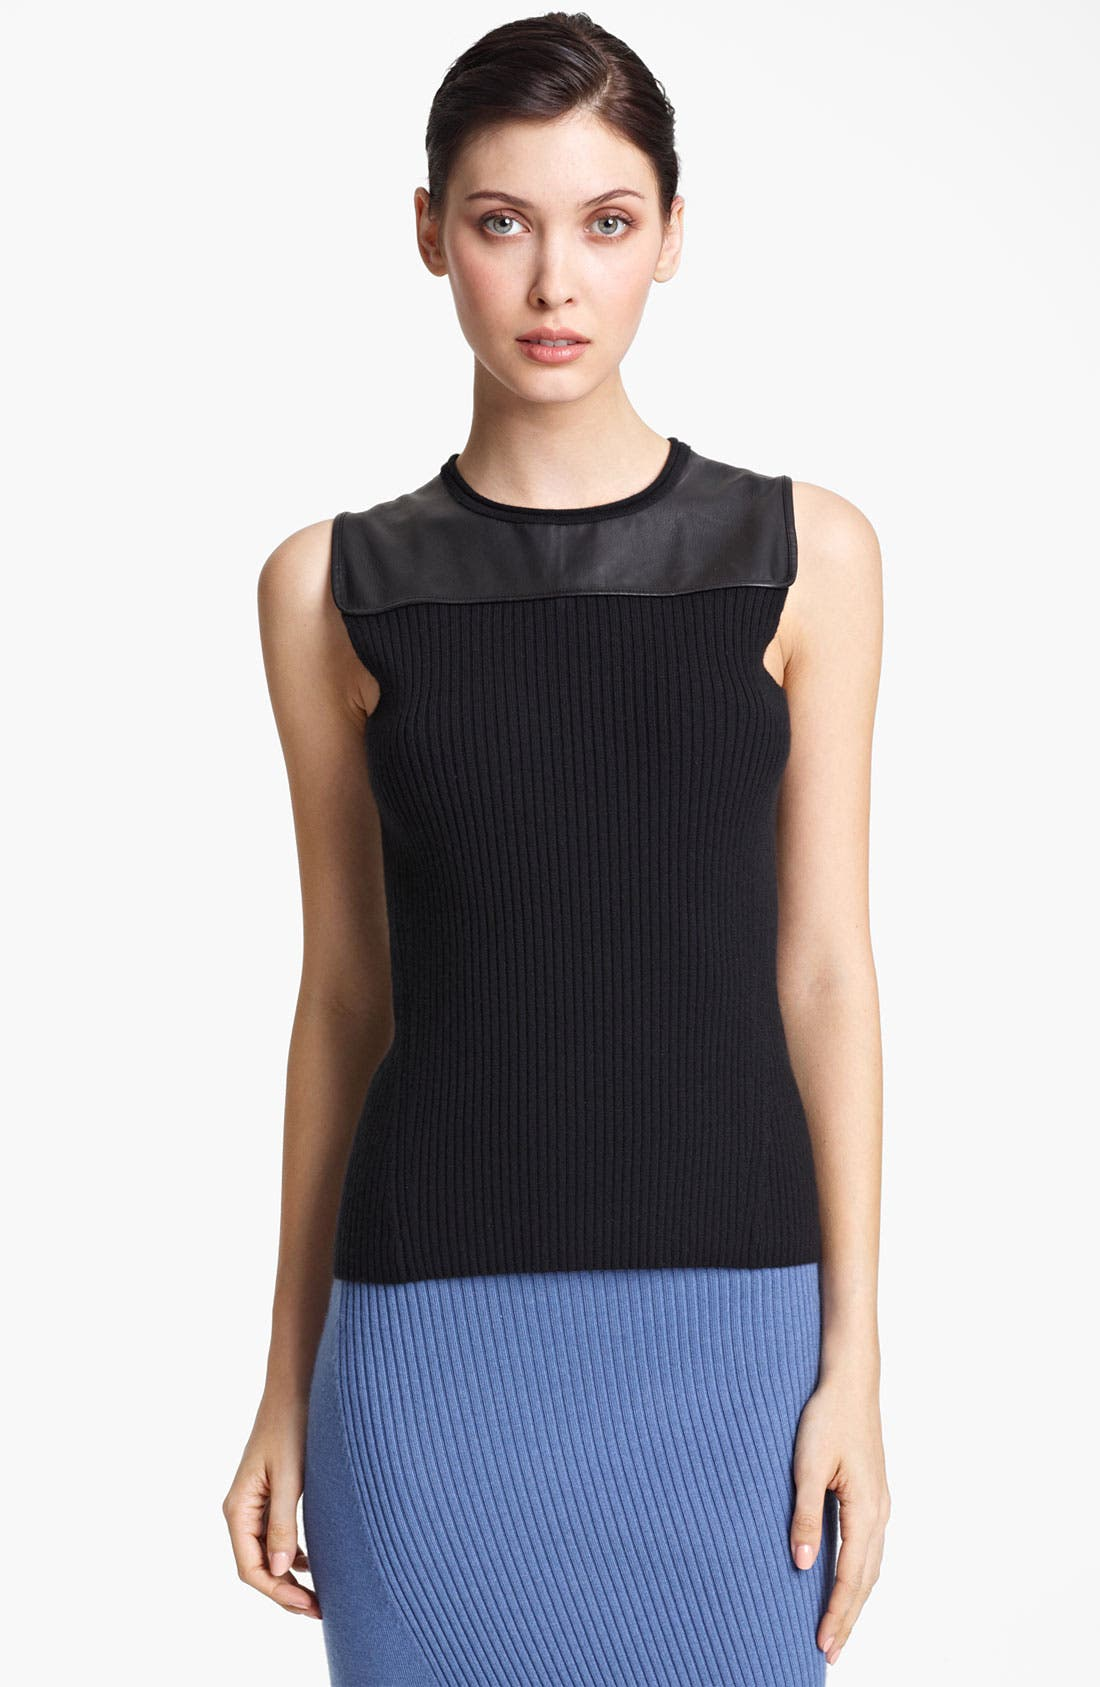 Alternate Image 1 Selected - Reed Krakoff Leather Yoke Knit Top